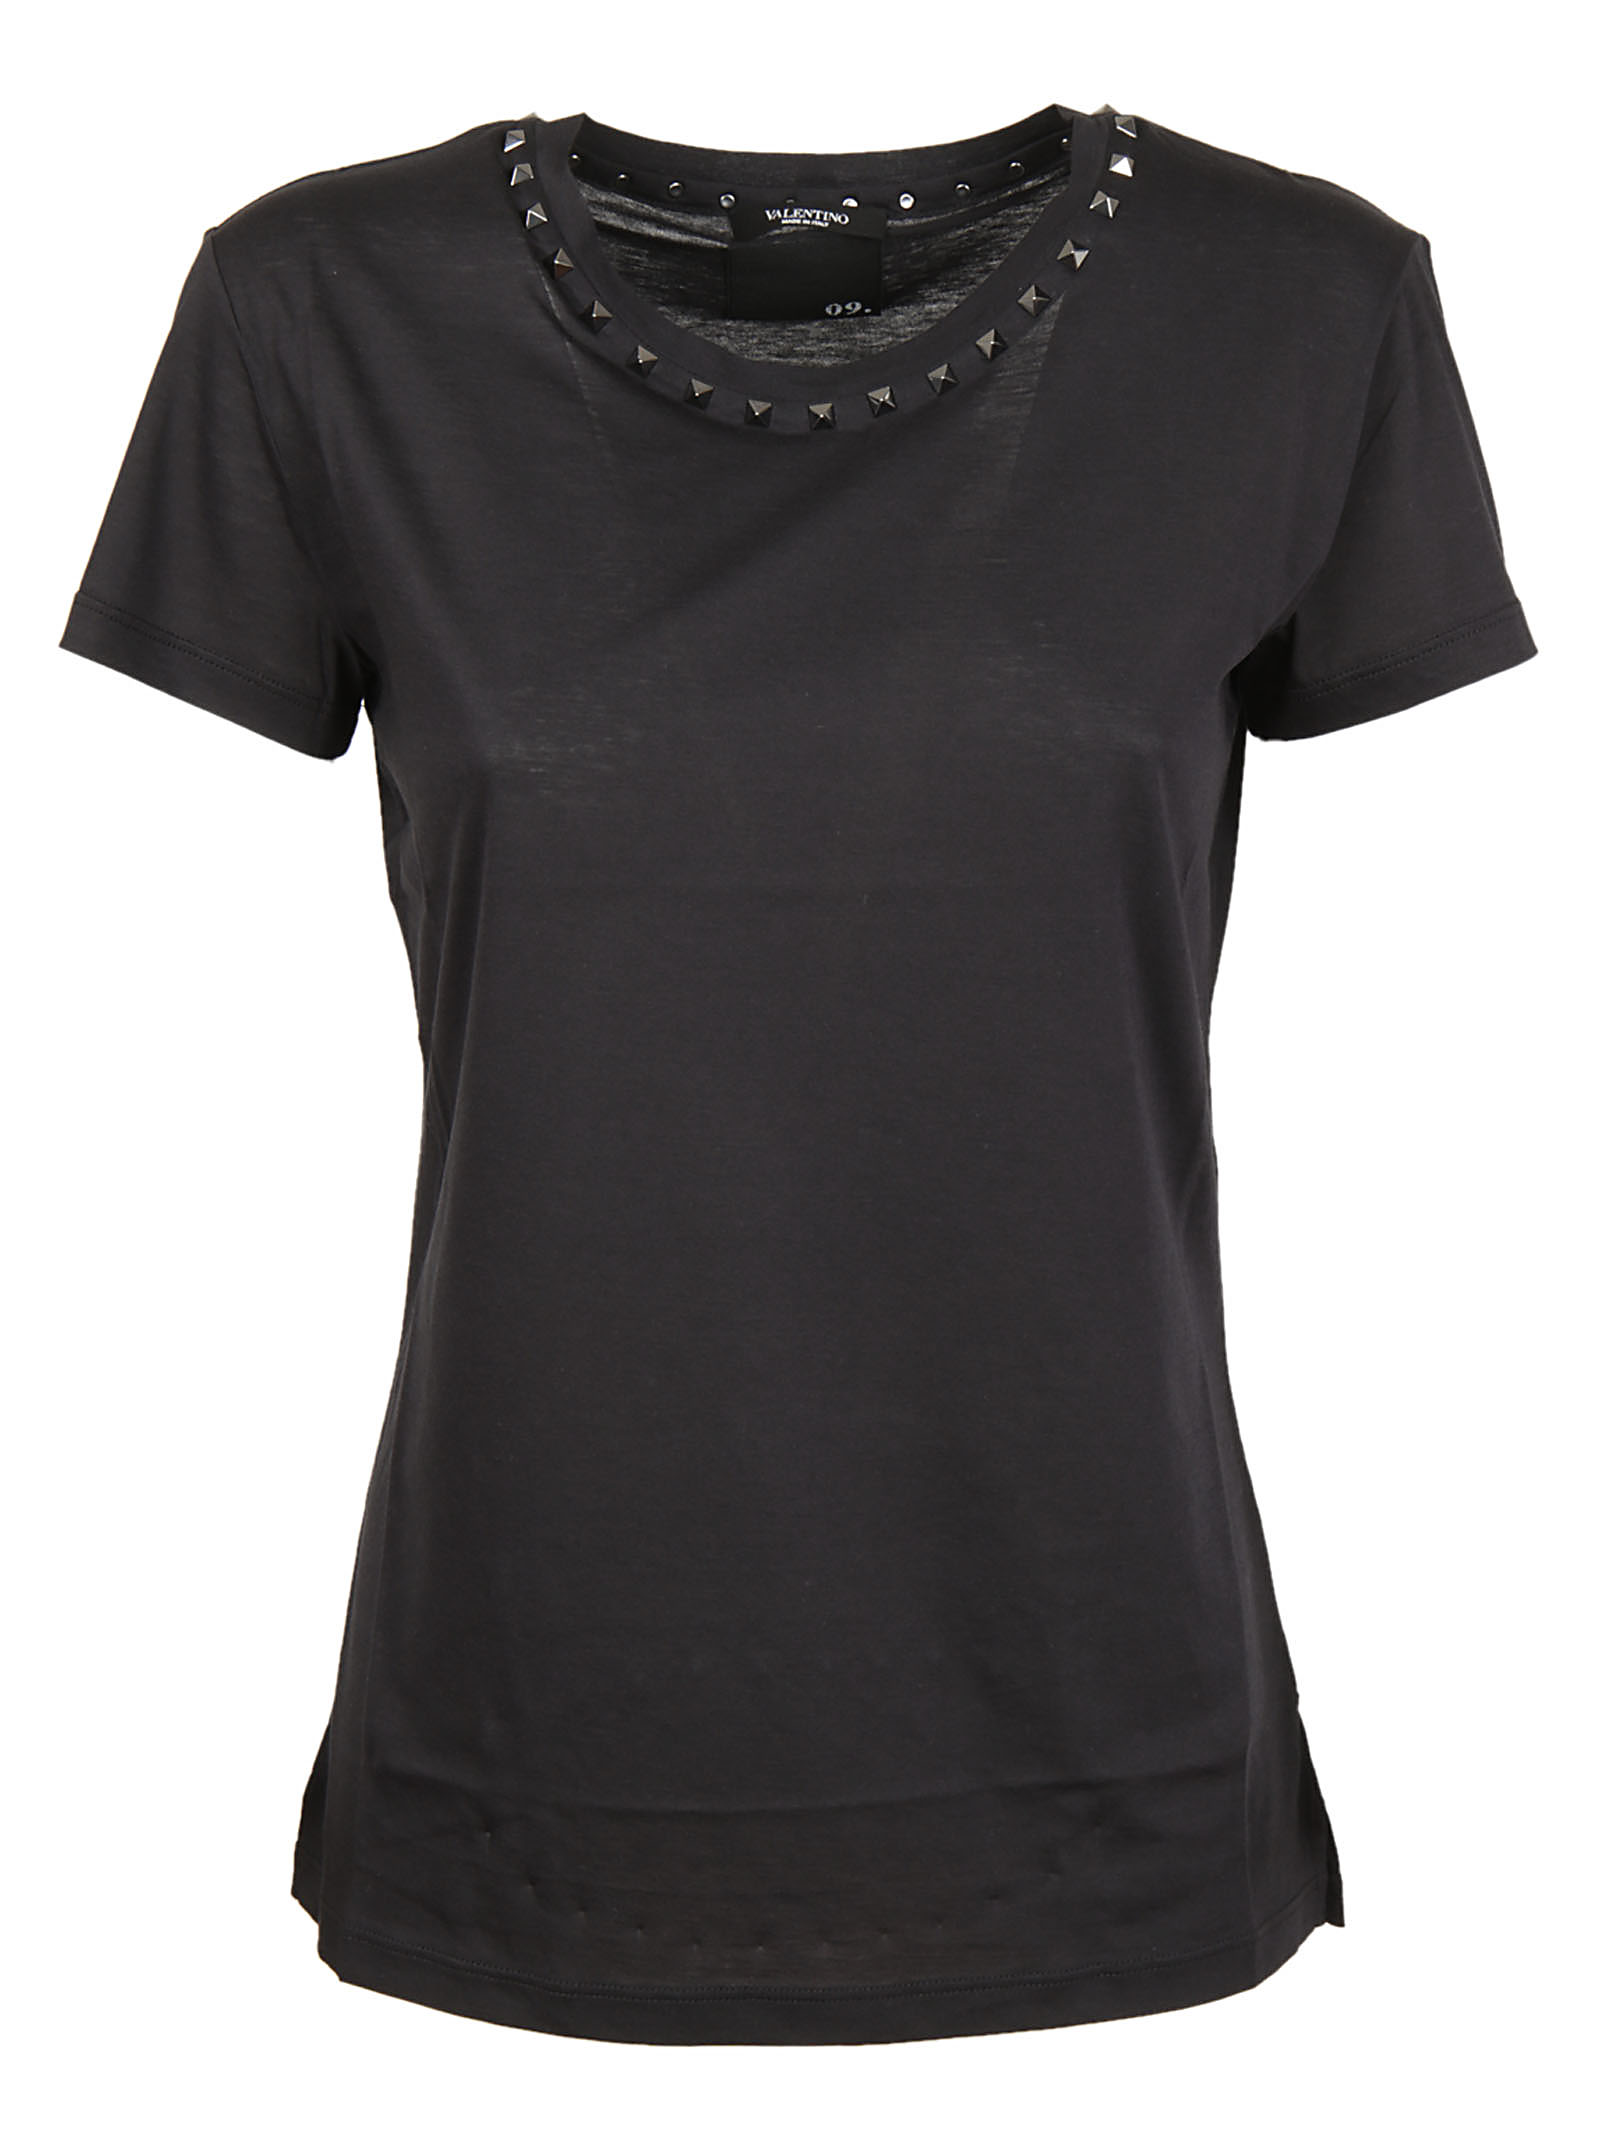 Valentino Valentino Rockstud T-Shirt